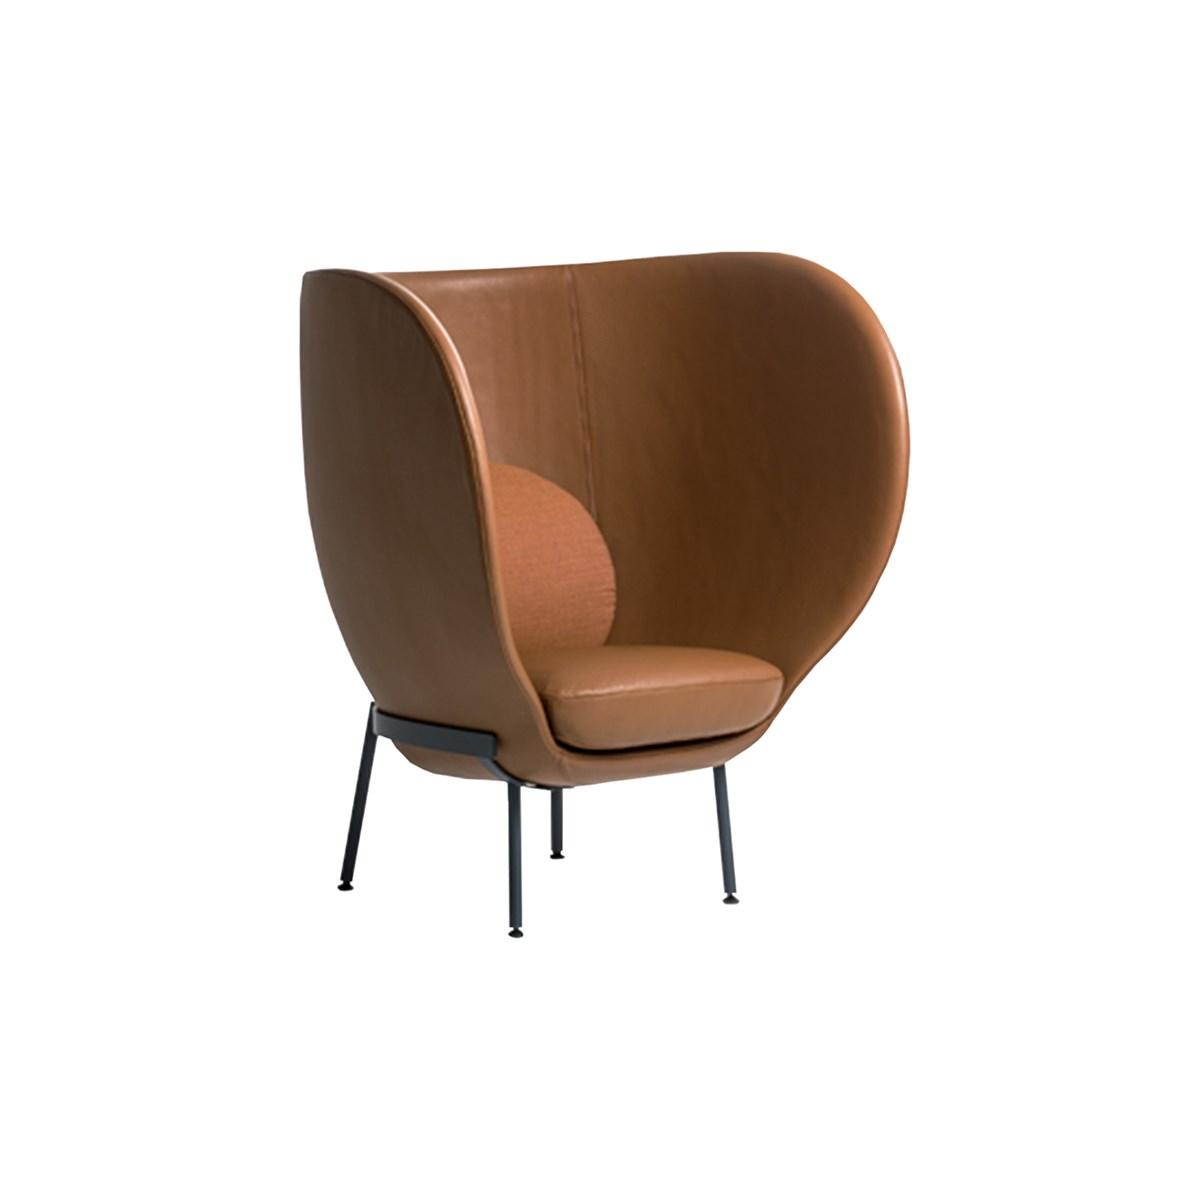 Moroso-Nipa-Doshi-Jonathan-Levien-Armada-Armchair-Matisse-1